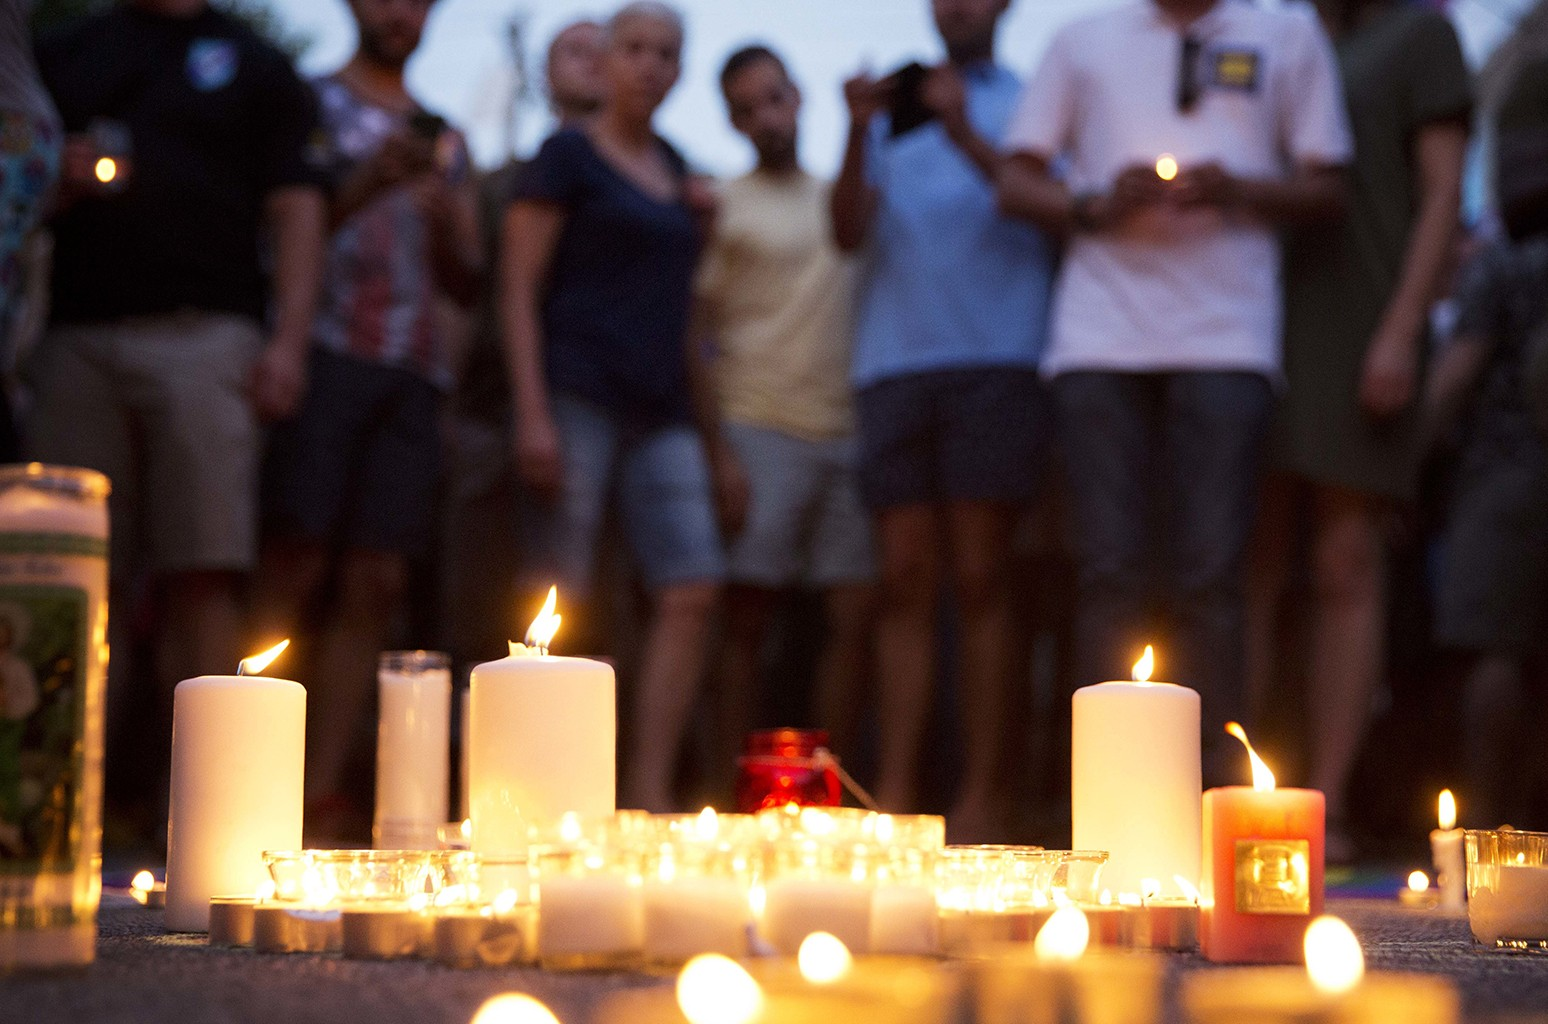 Candelight Vigil in honor of Orlando